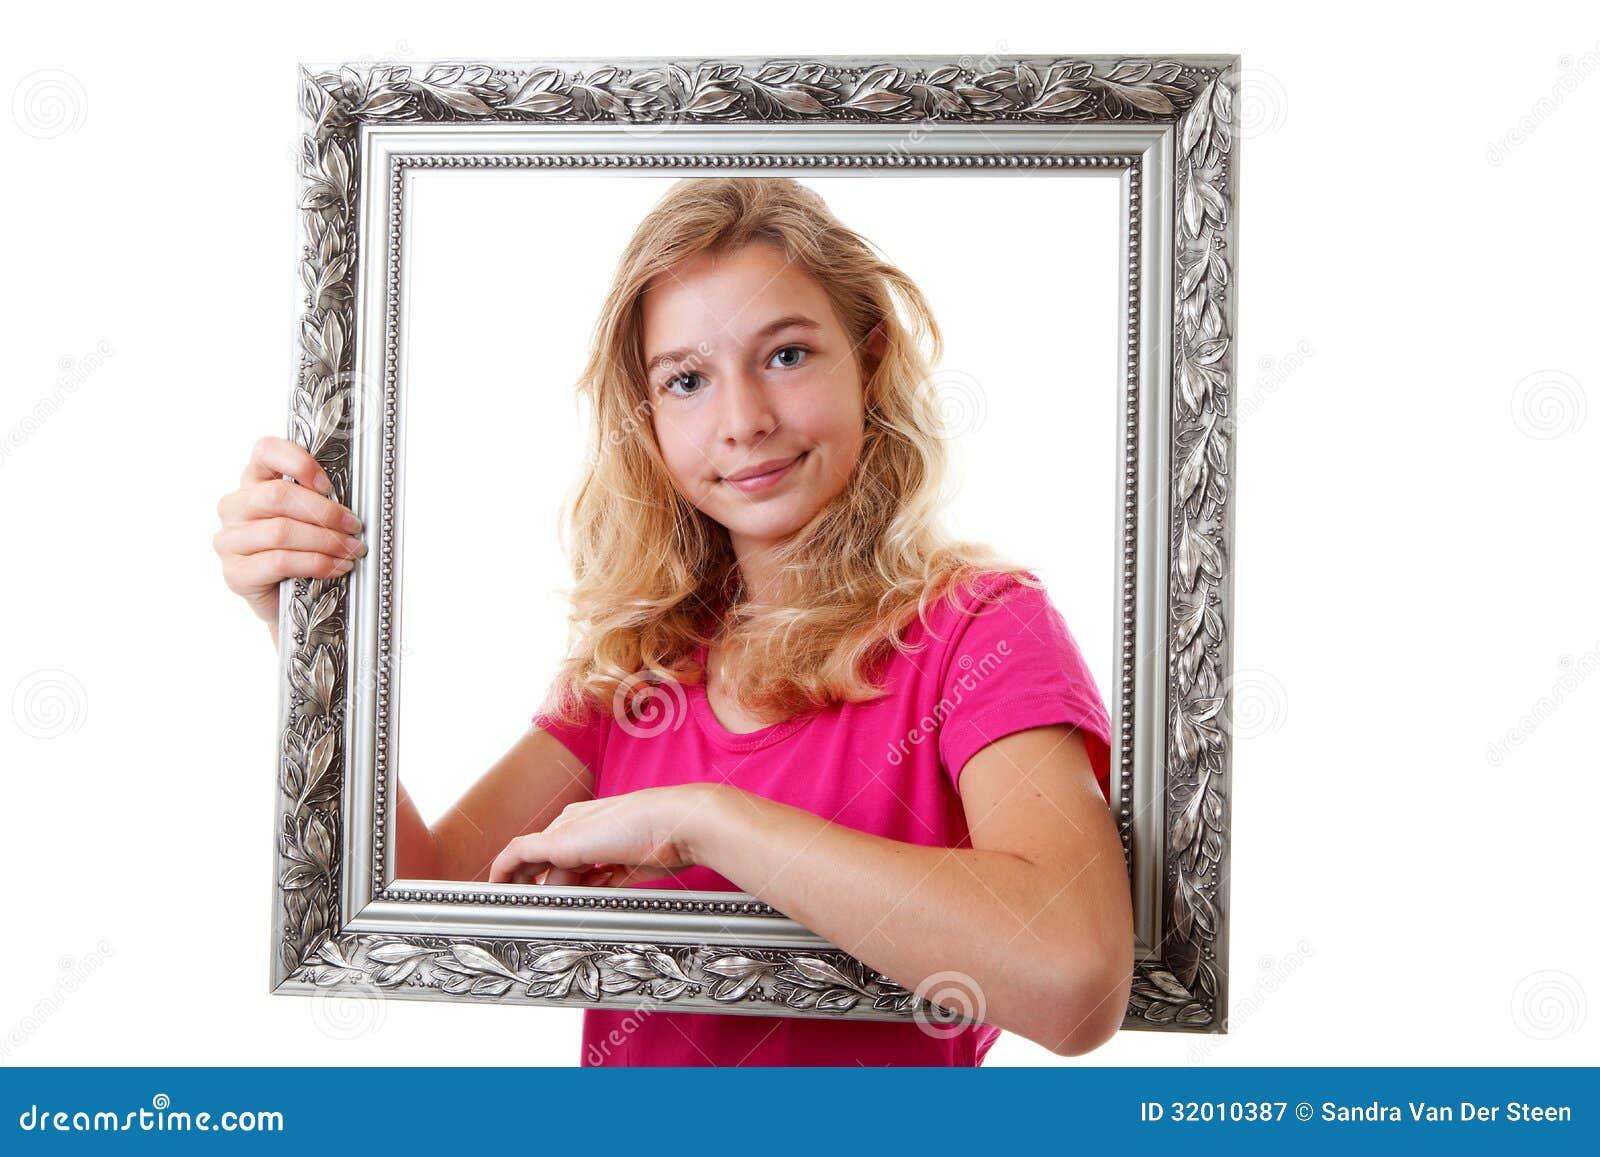 Holding Frame - Page 4 - Frame Design & Reviews ✓